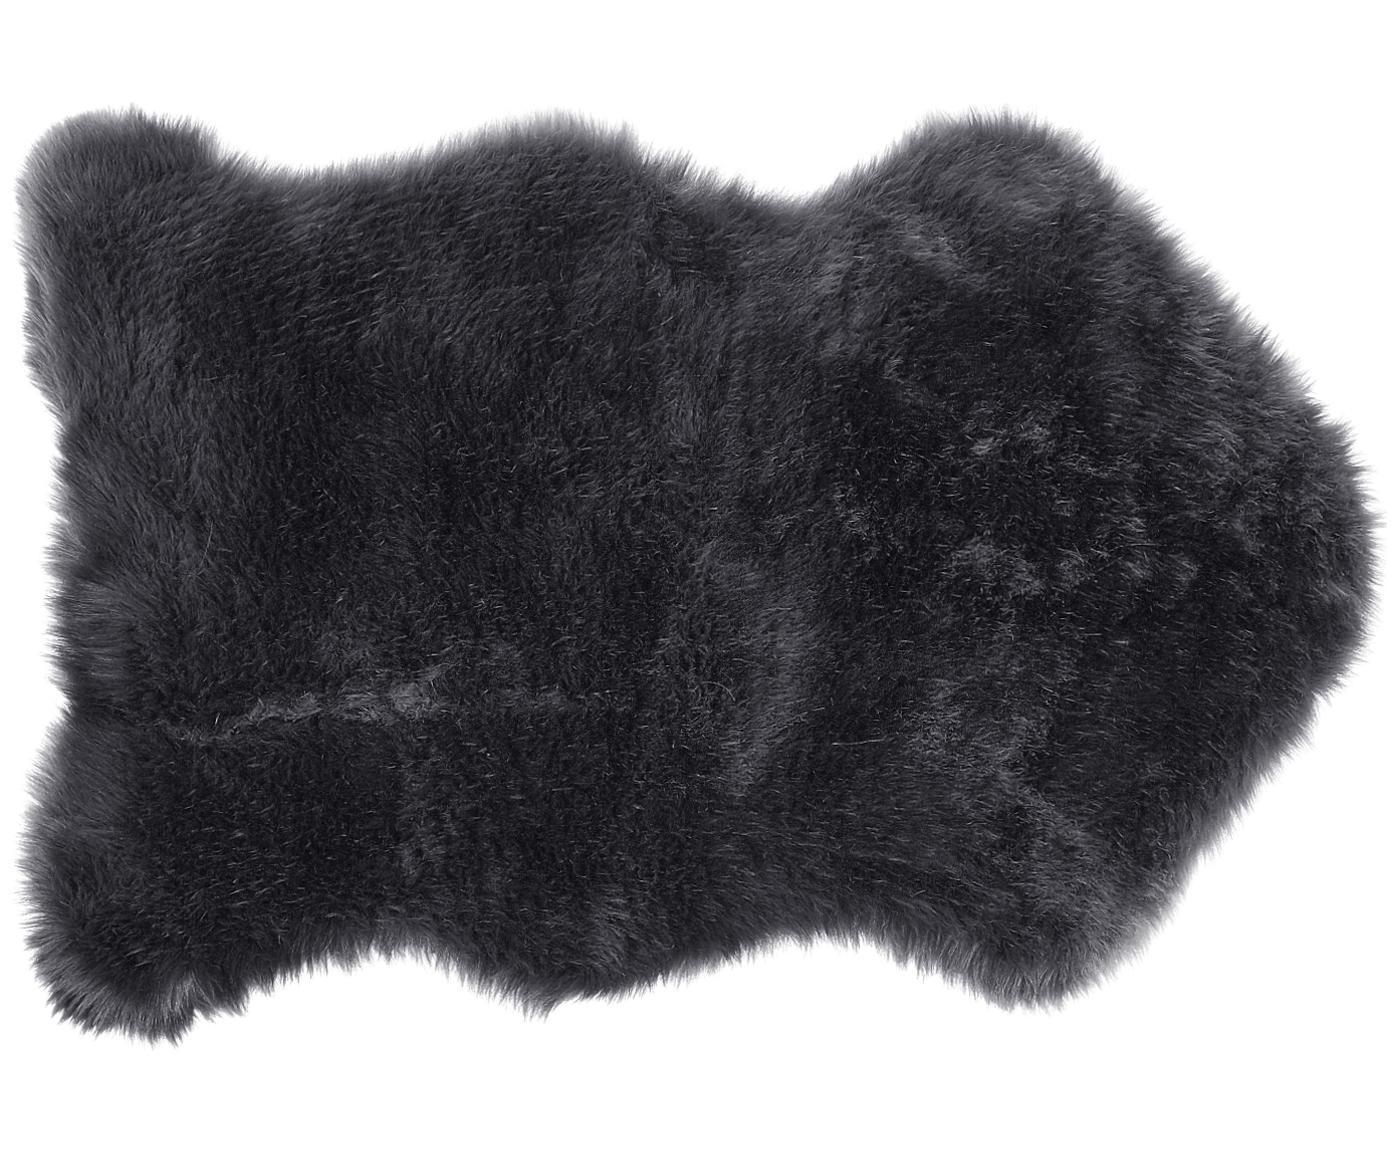 Kunstfell Mathilde, glatt, Vorderseite: 65% Acryl, 35% Polyester, Rückseite: 100% Polyester, Dunkelgrau, 60 x 90 cm